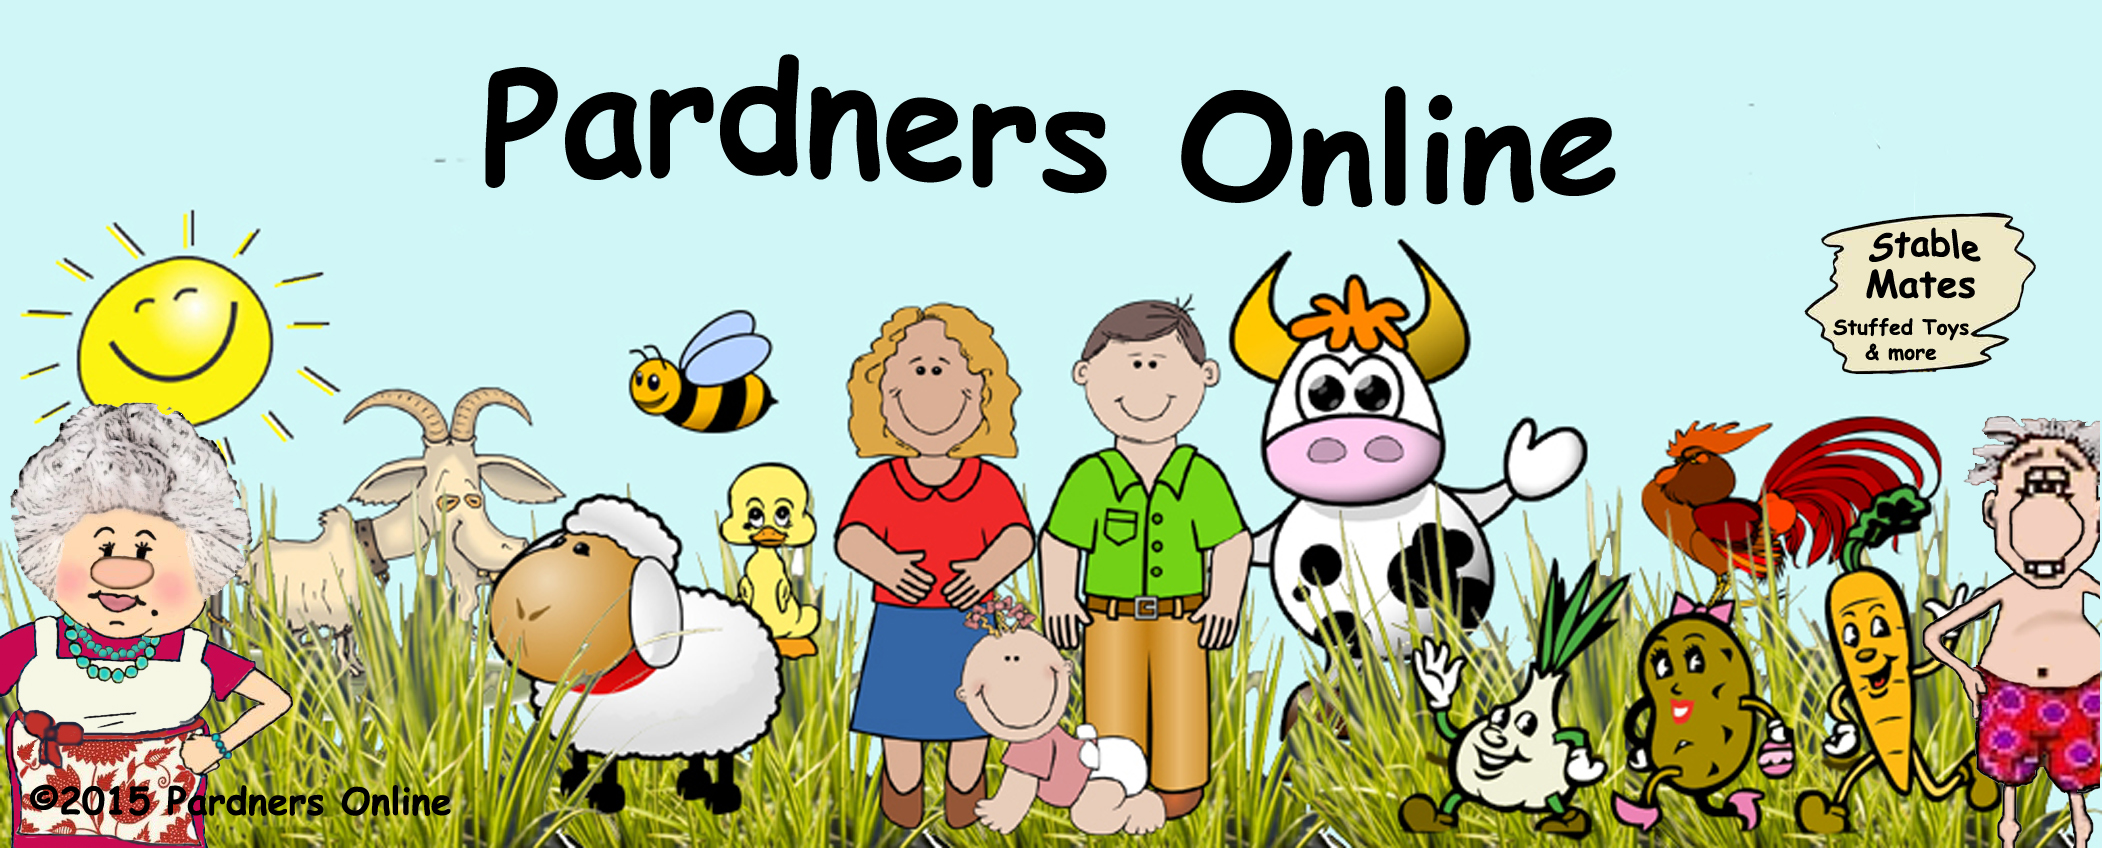 Pardners Online